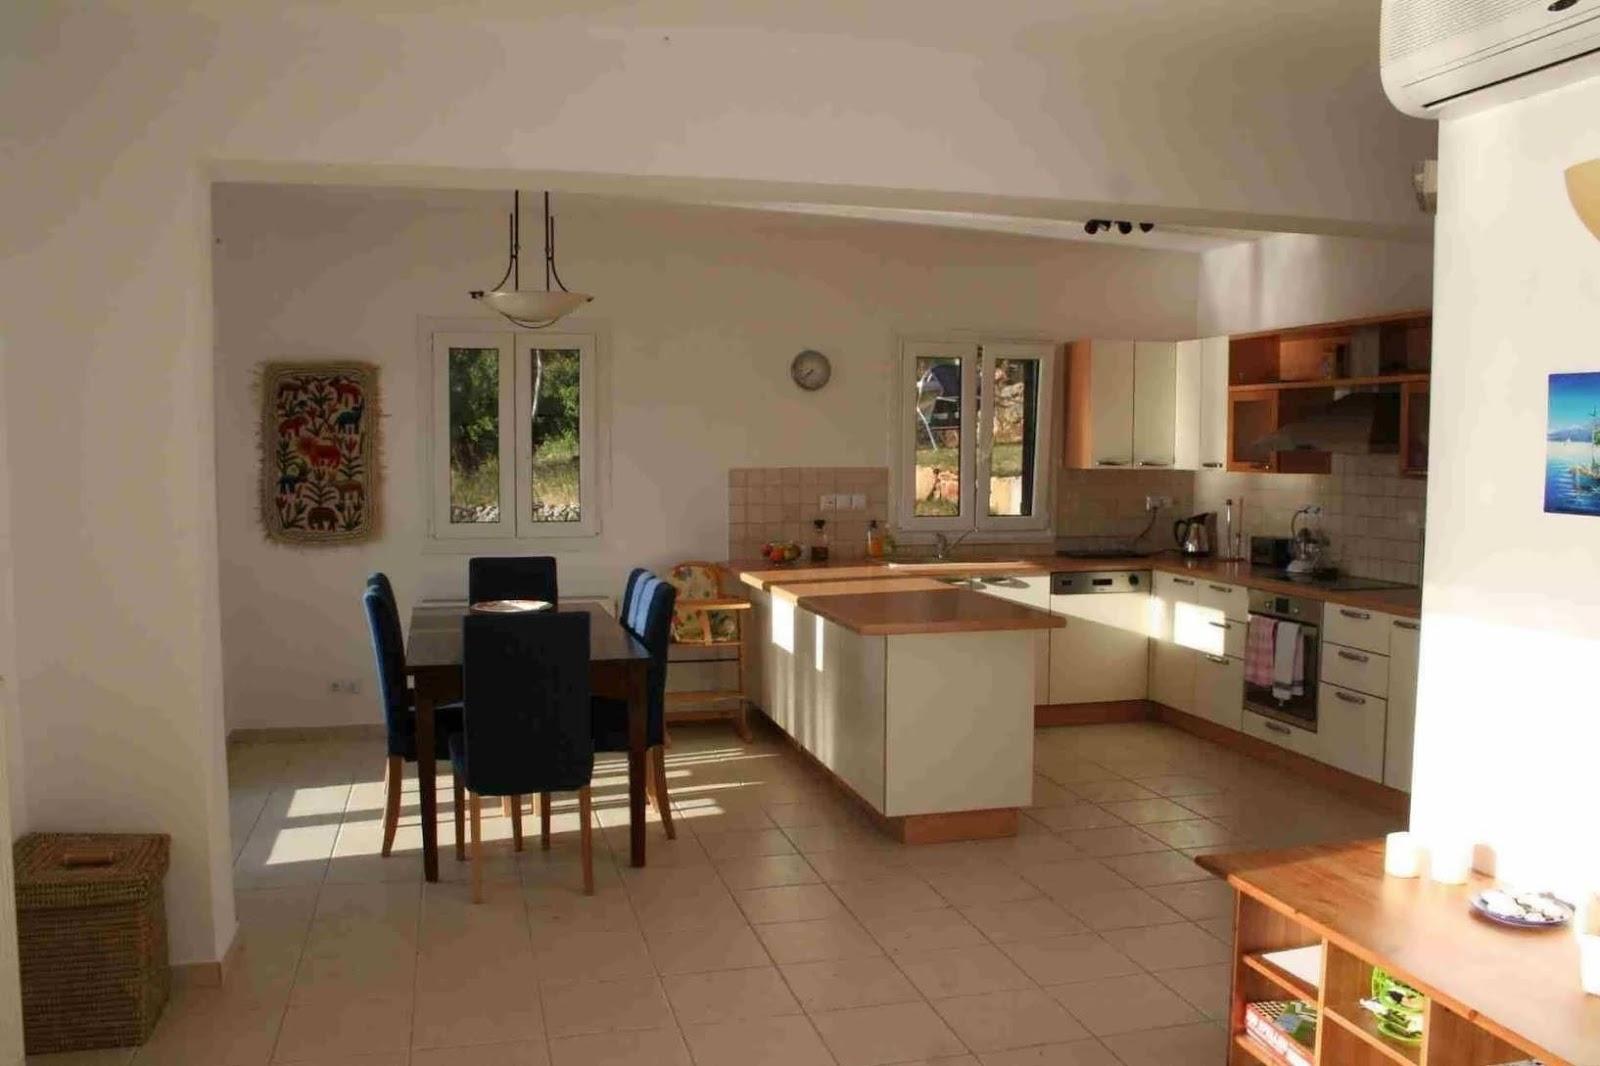 Open Plan Kitchen Diner Living Room Ideas Garden Decorating